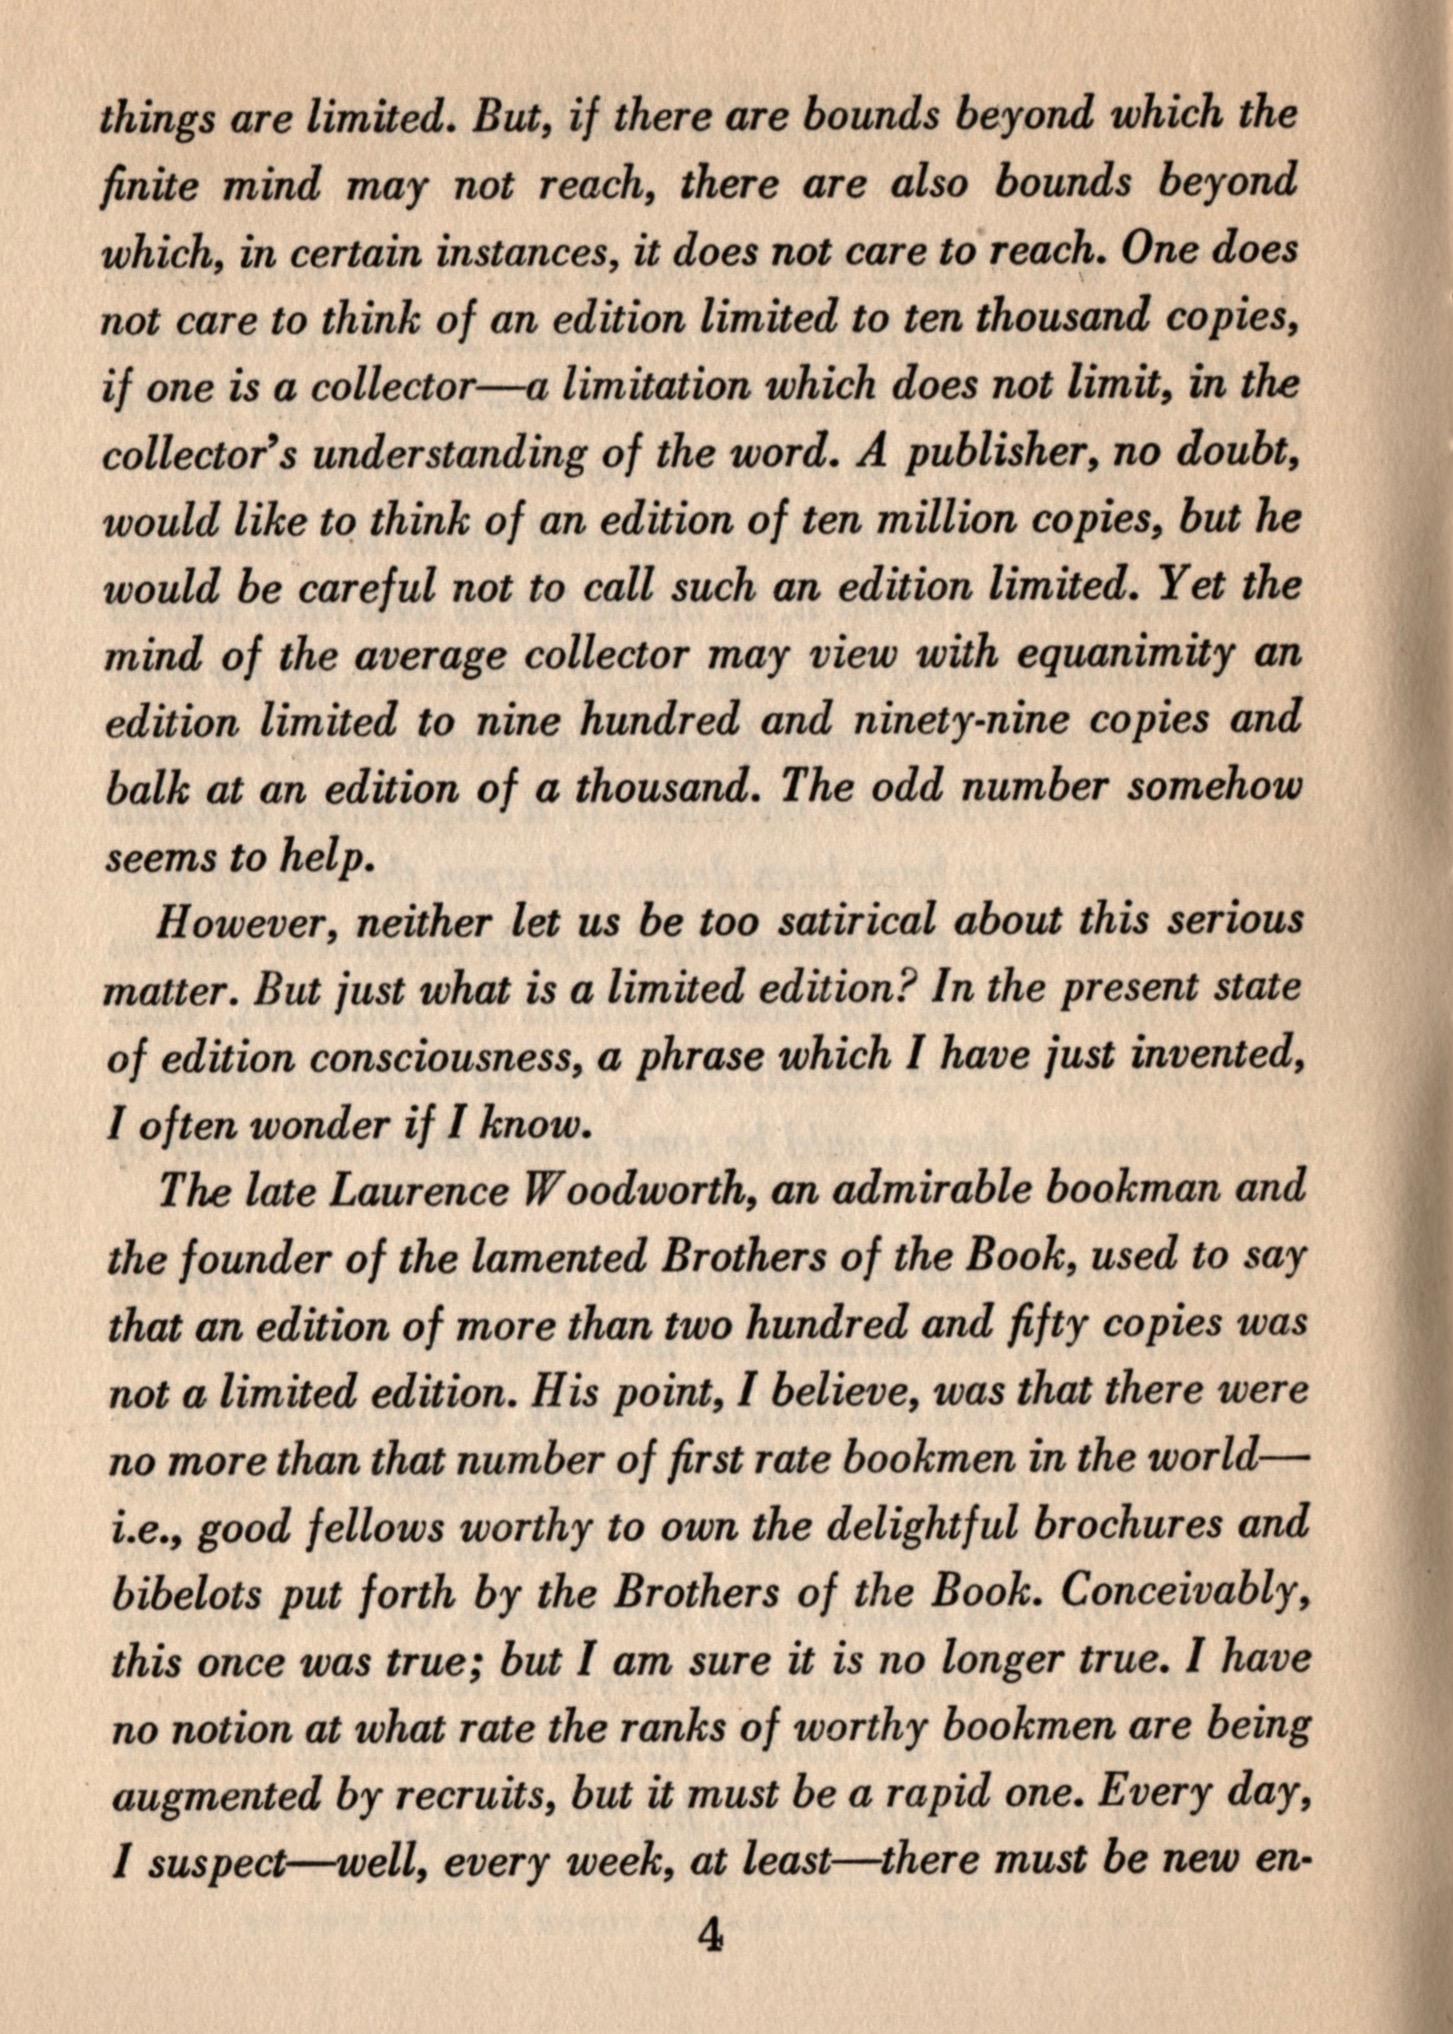 Covici Friede catalogue 1929 Page 2.jpeg